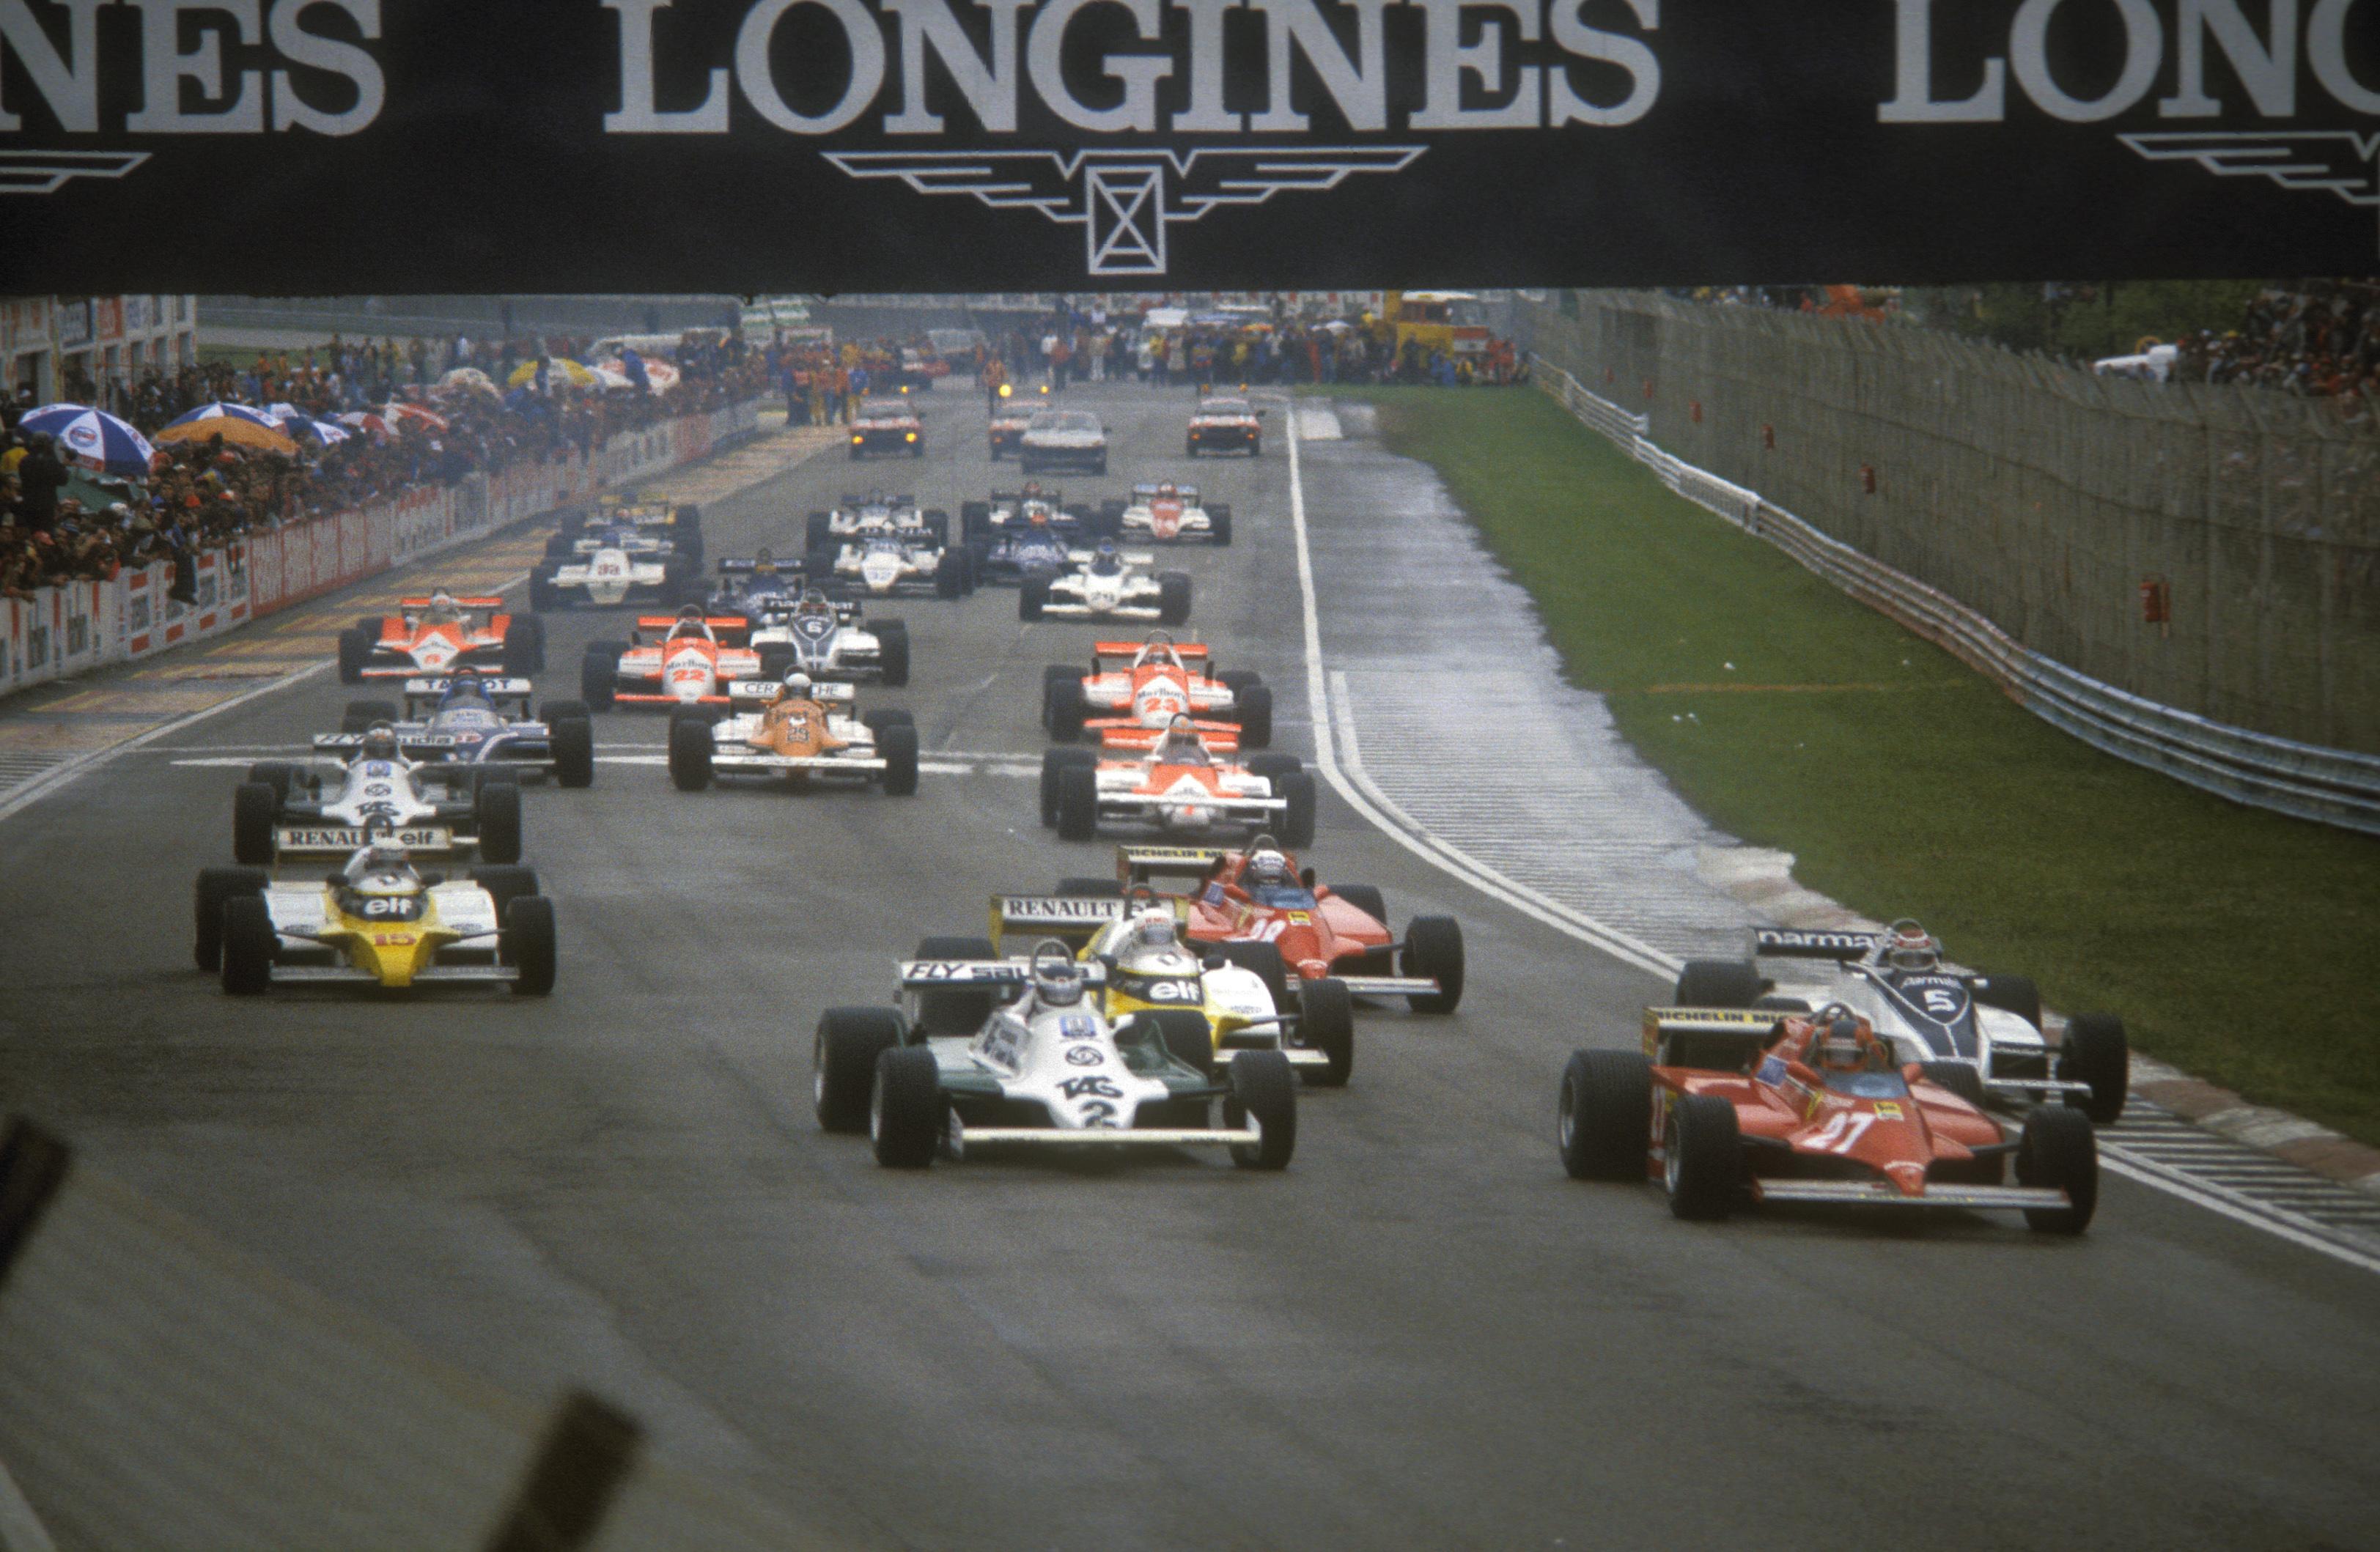 Gilles Villeneuve, San Marino Grand Prix, F1 1981